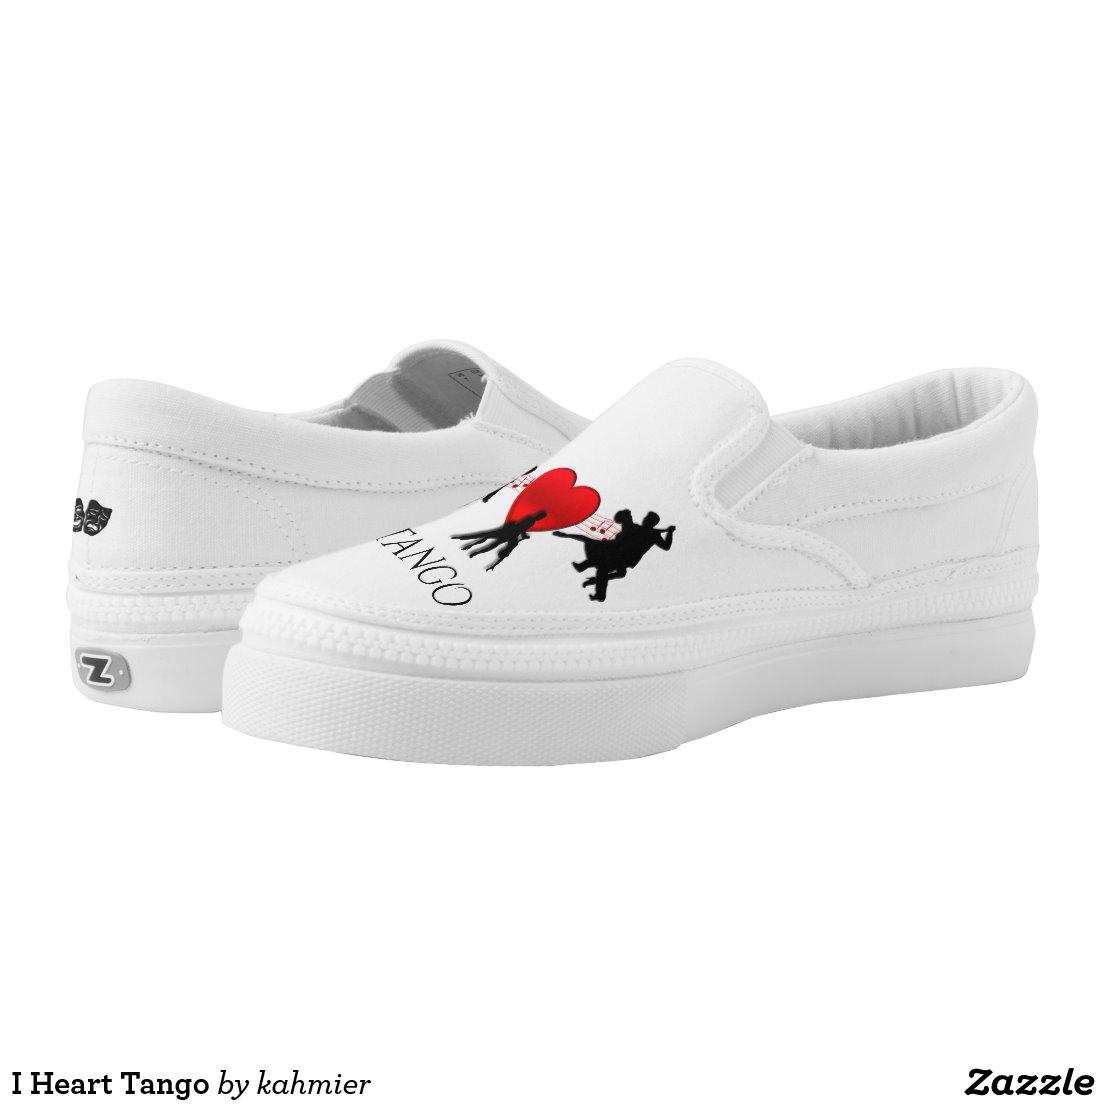 I Heart Tango Slip-On Sneakers